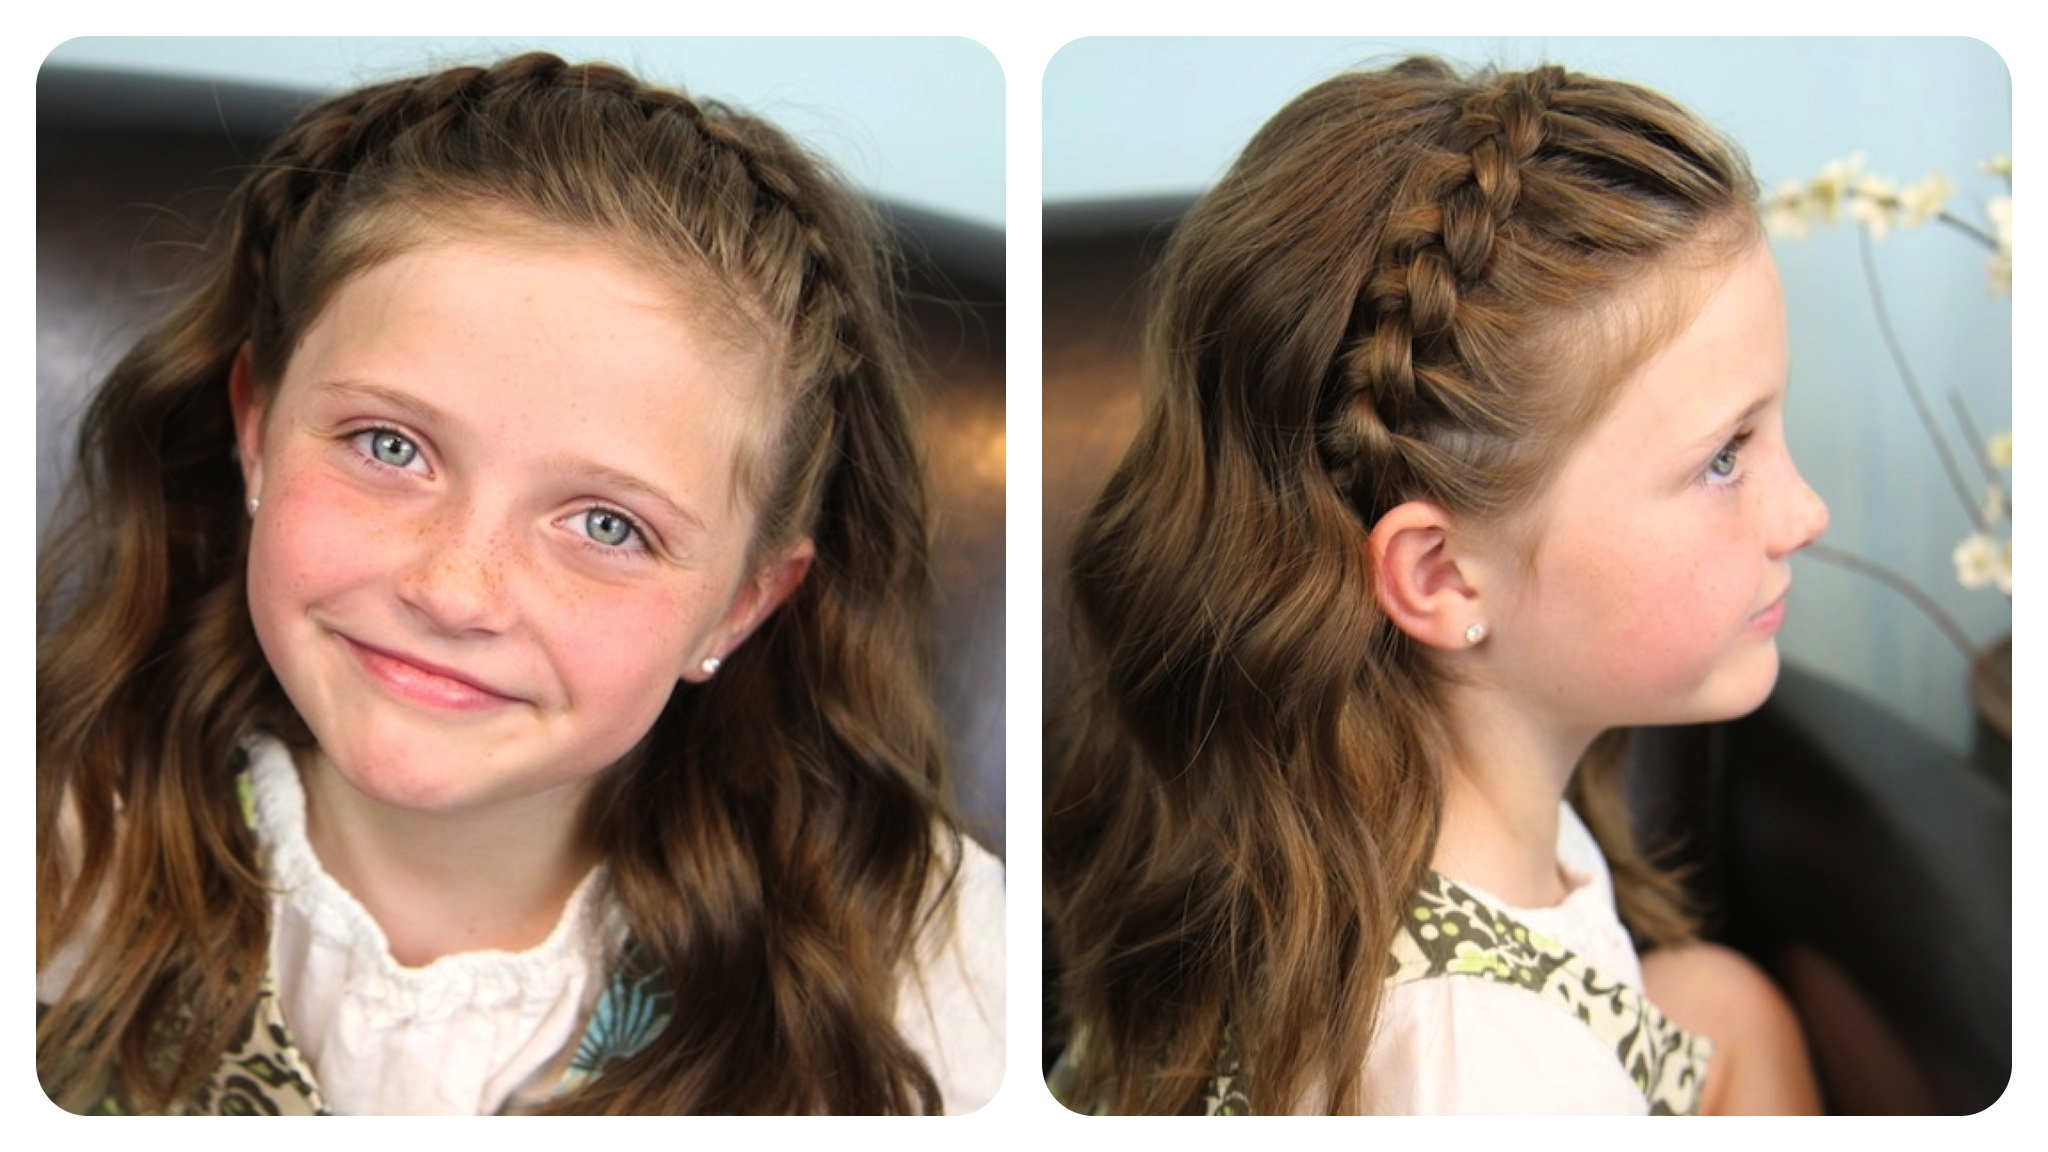 Dutch Lace Braided Headband Braid Hairstyles Cute Girls